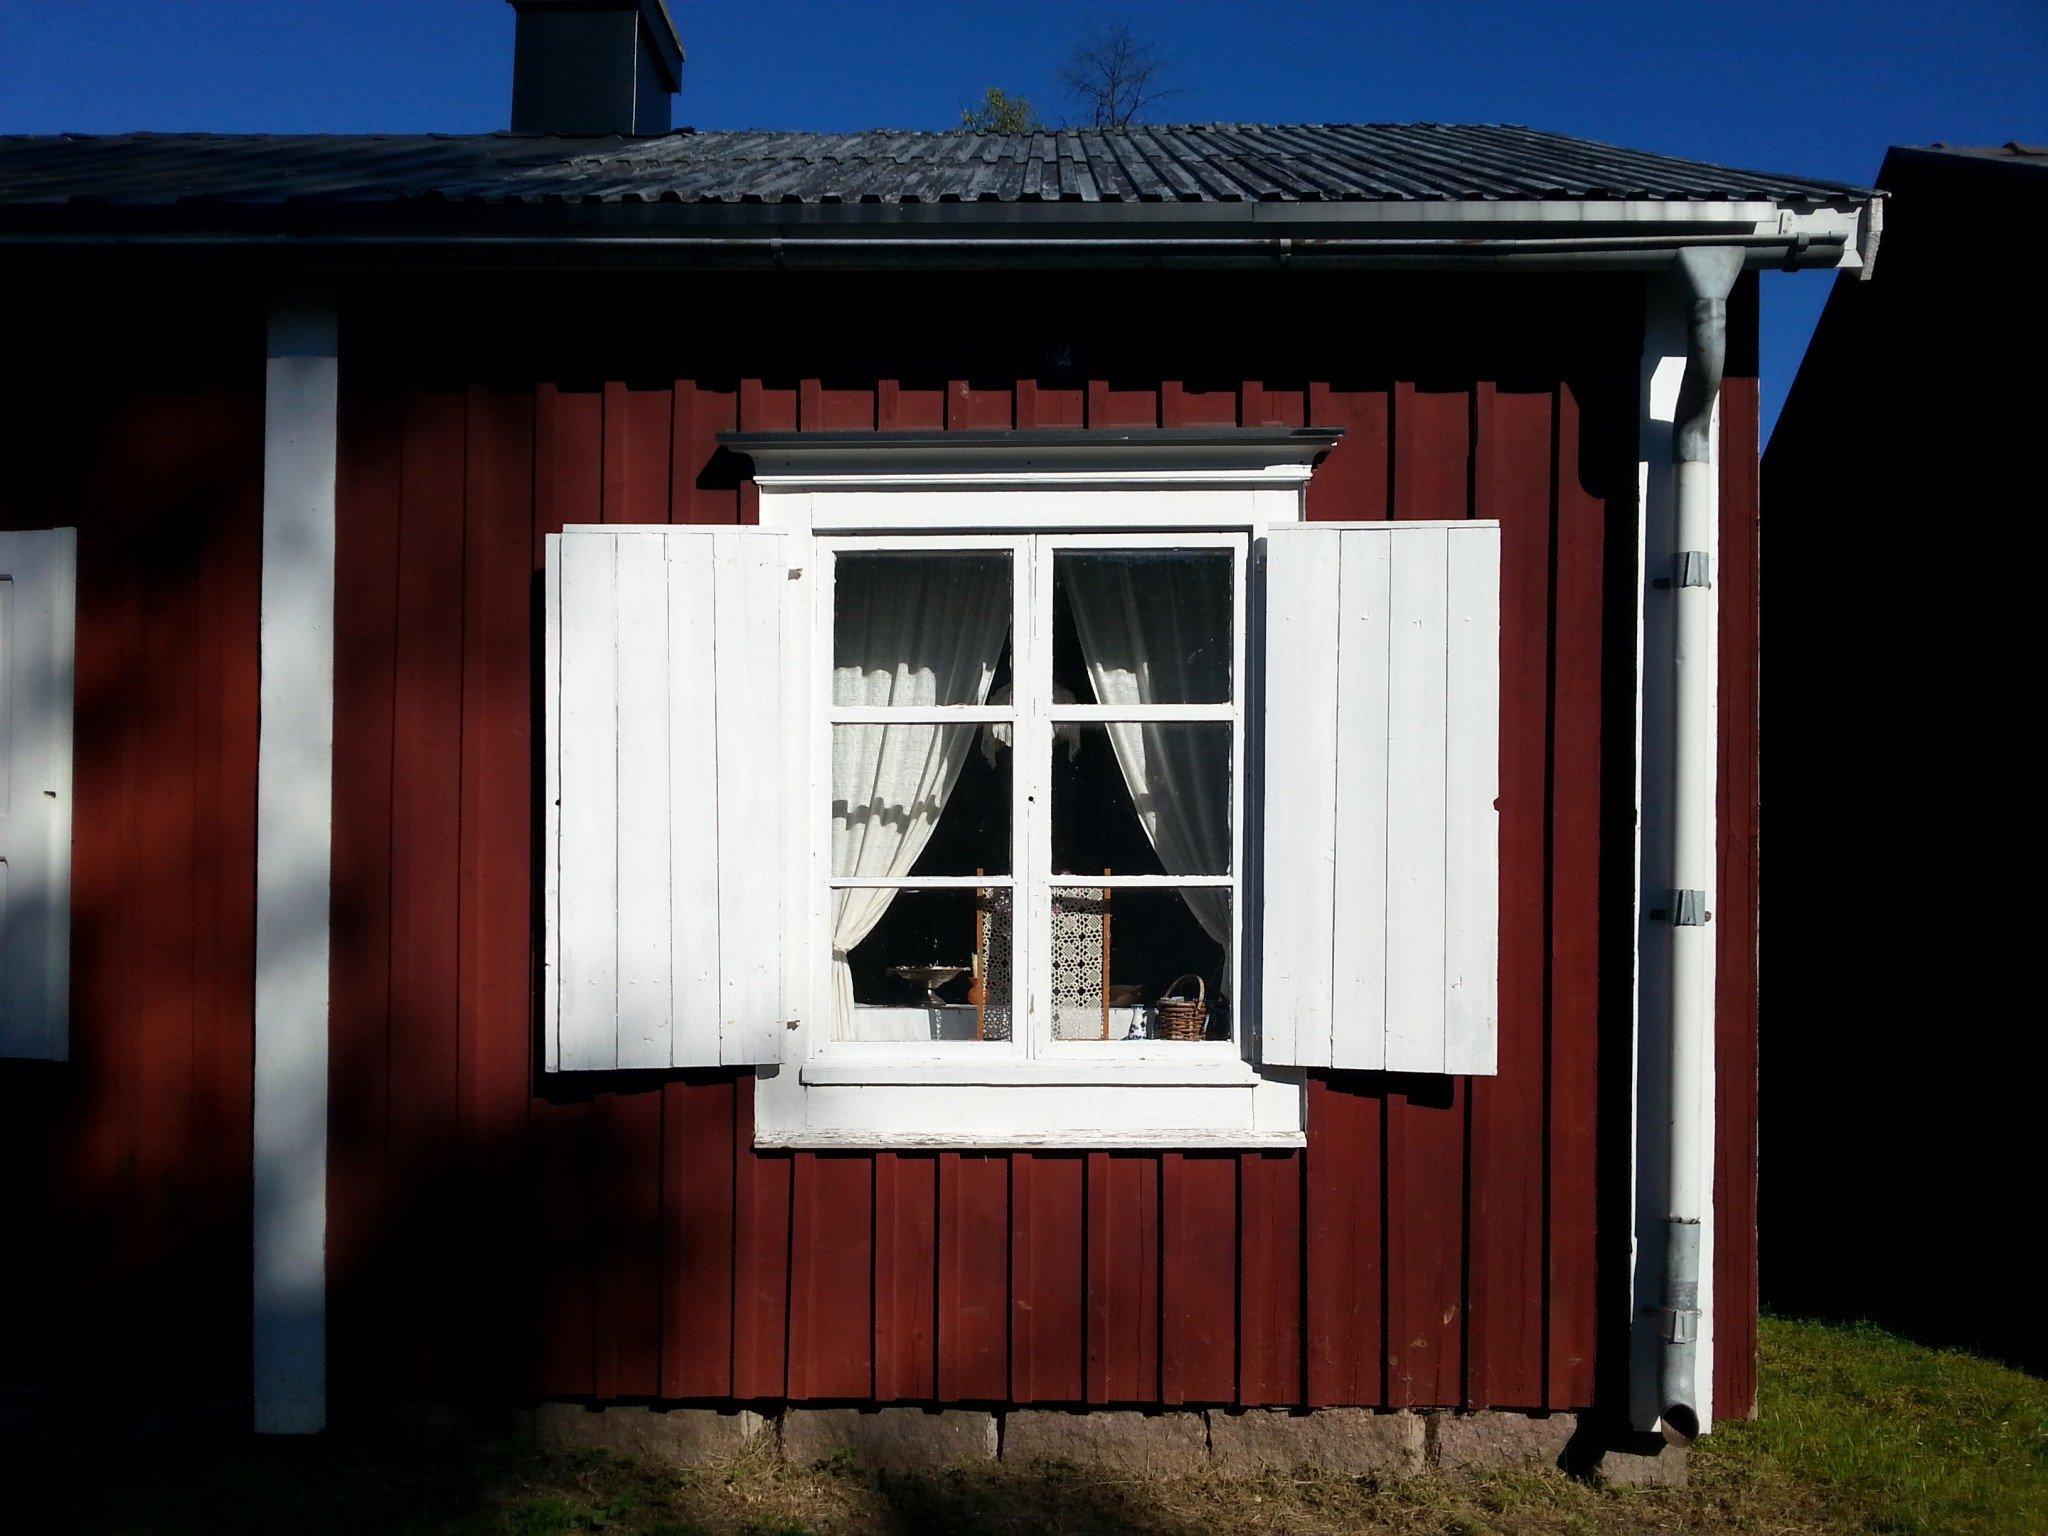 Gammelstad_luulaja (15)